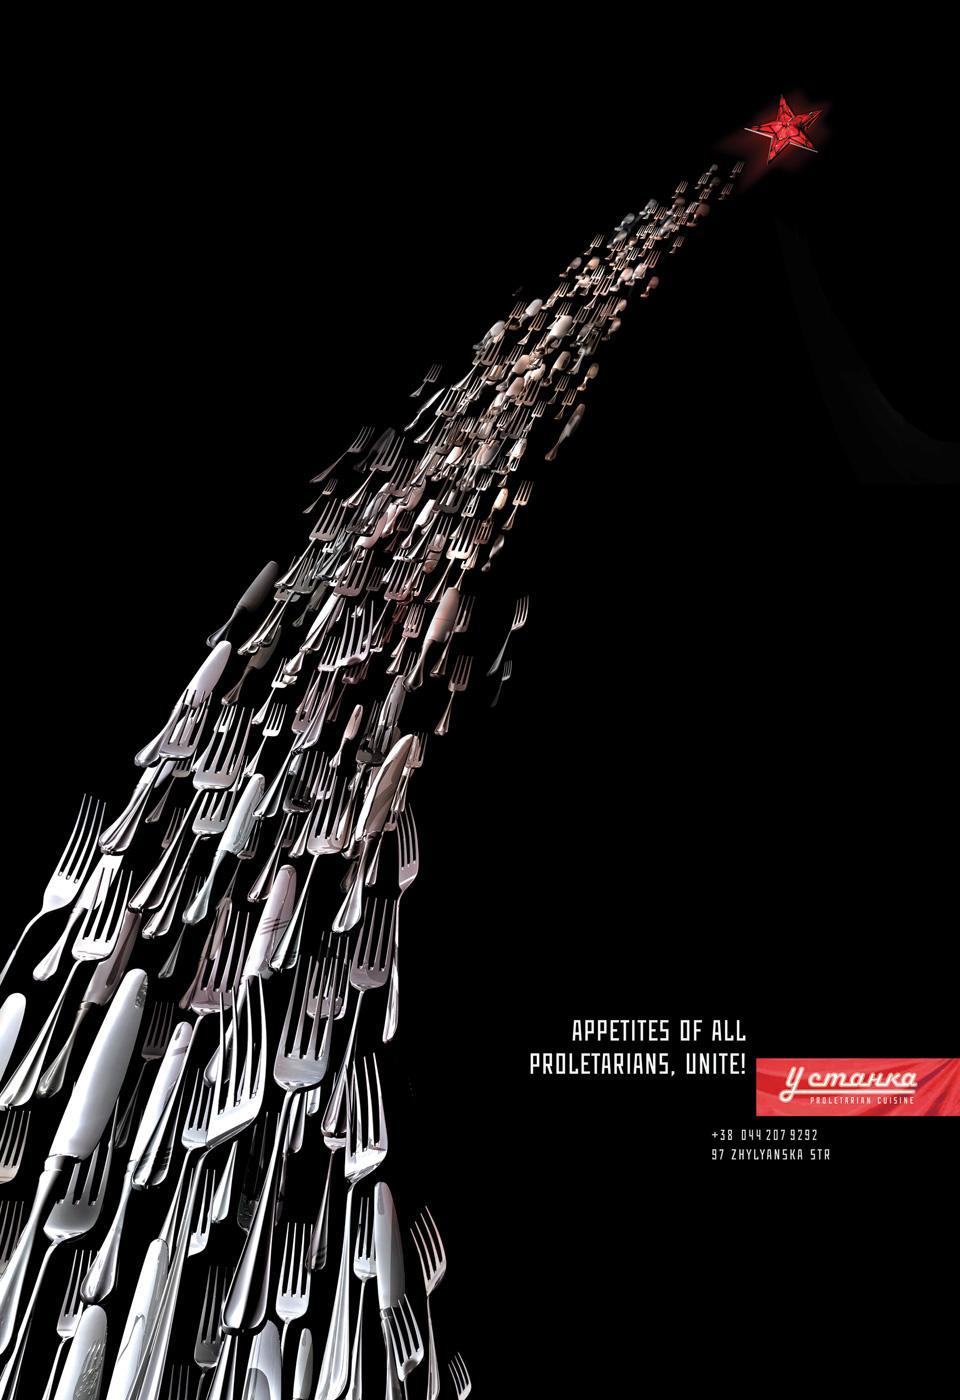 U Stanka Print Ad -  Forks & Knives